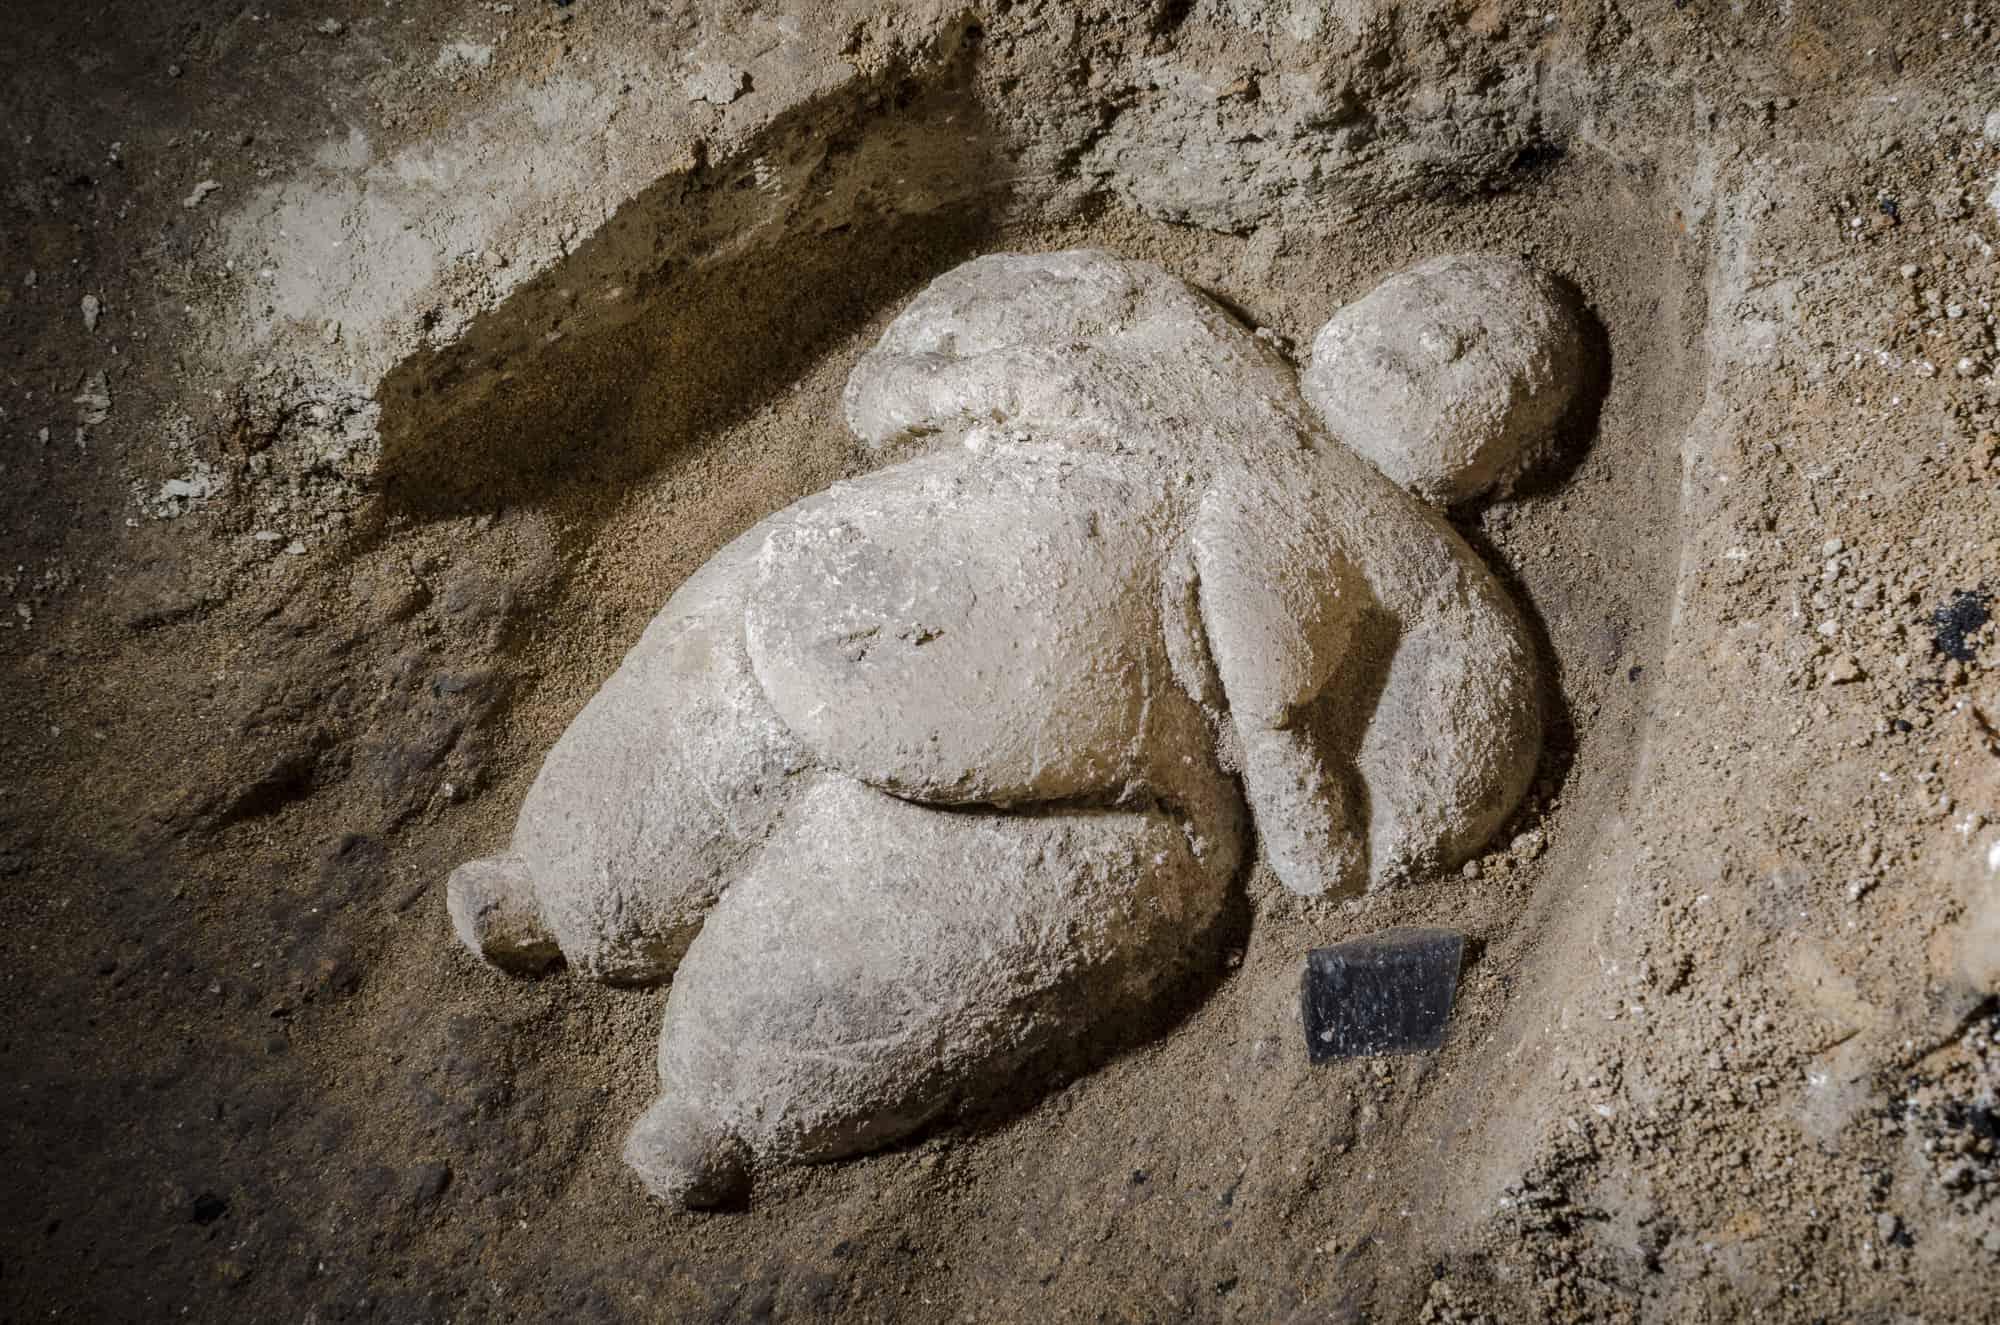 Obese Goddesses of Çatalhöyük